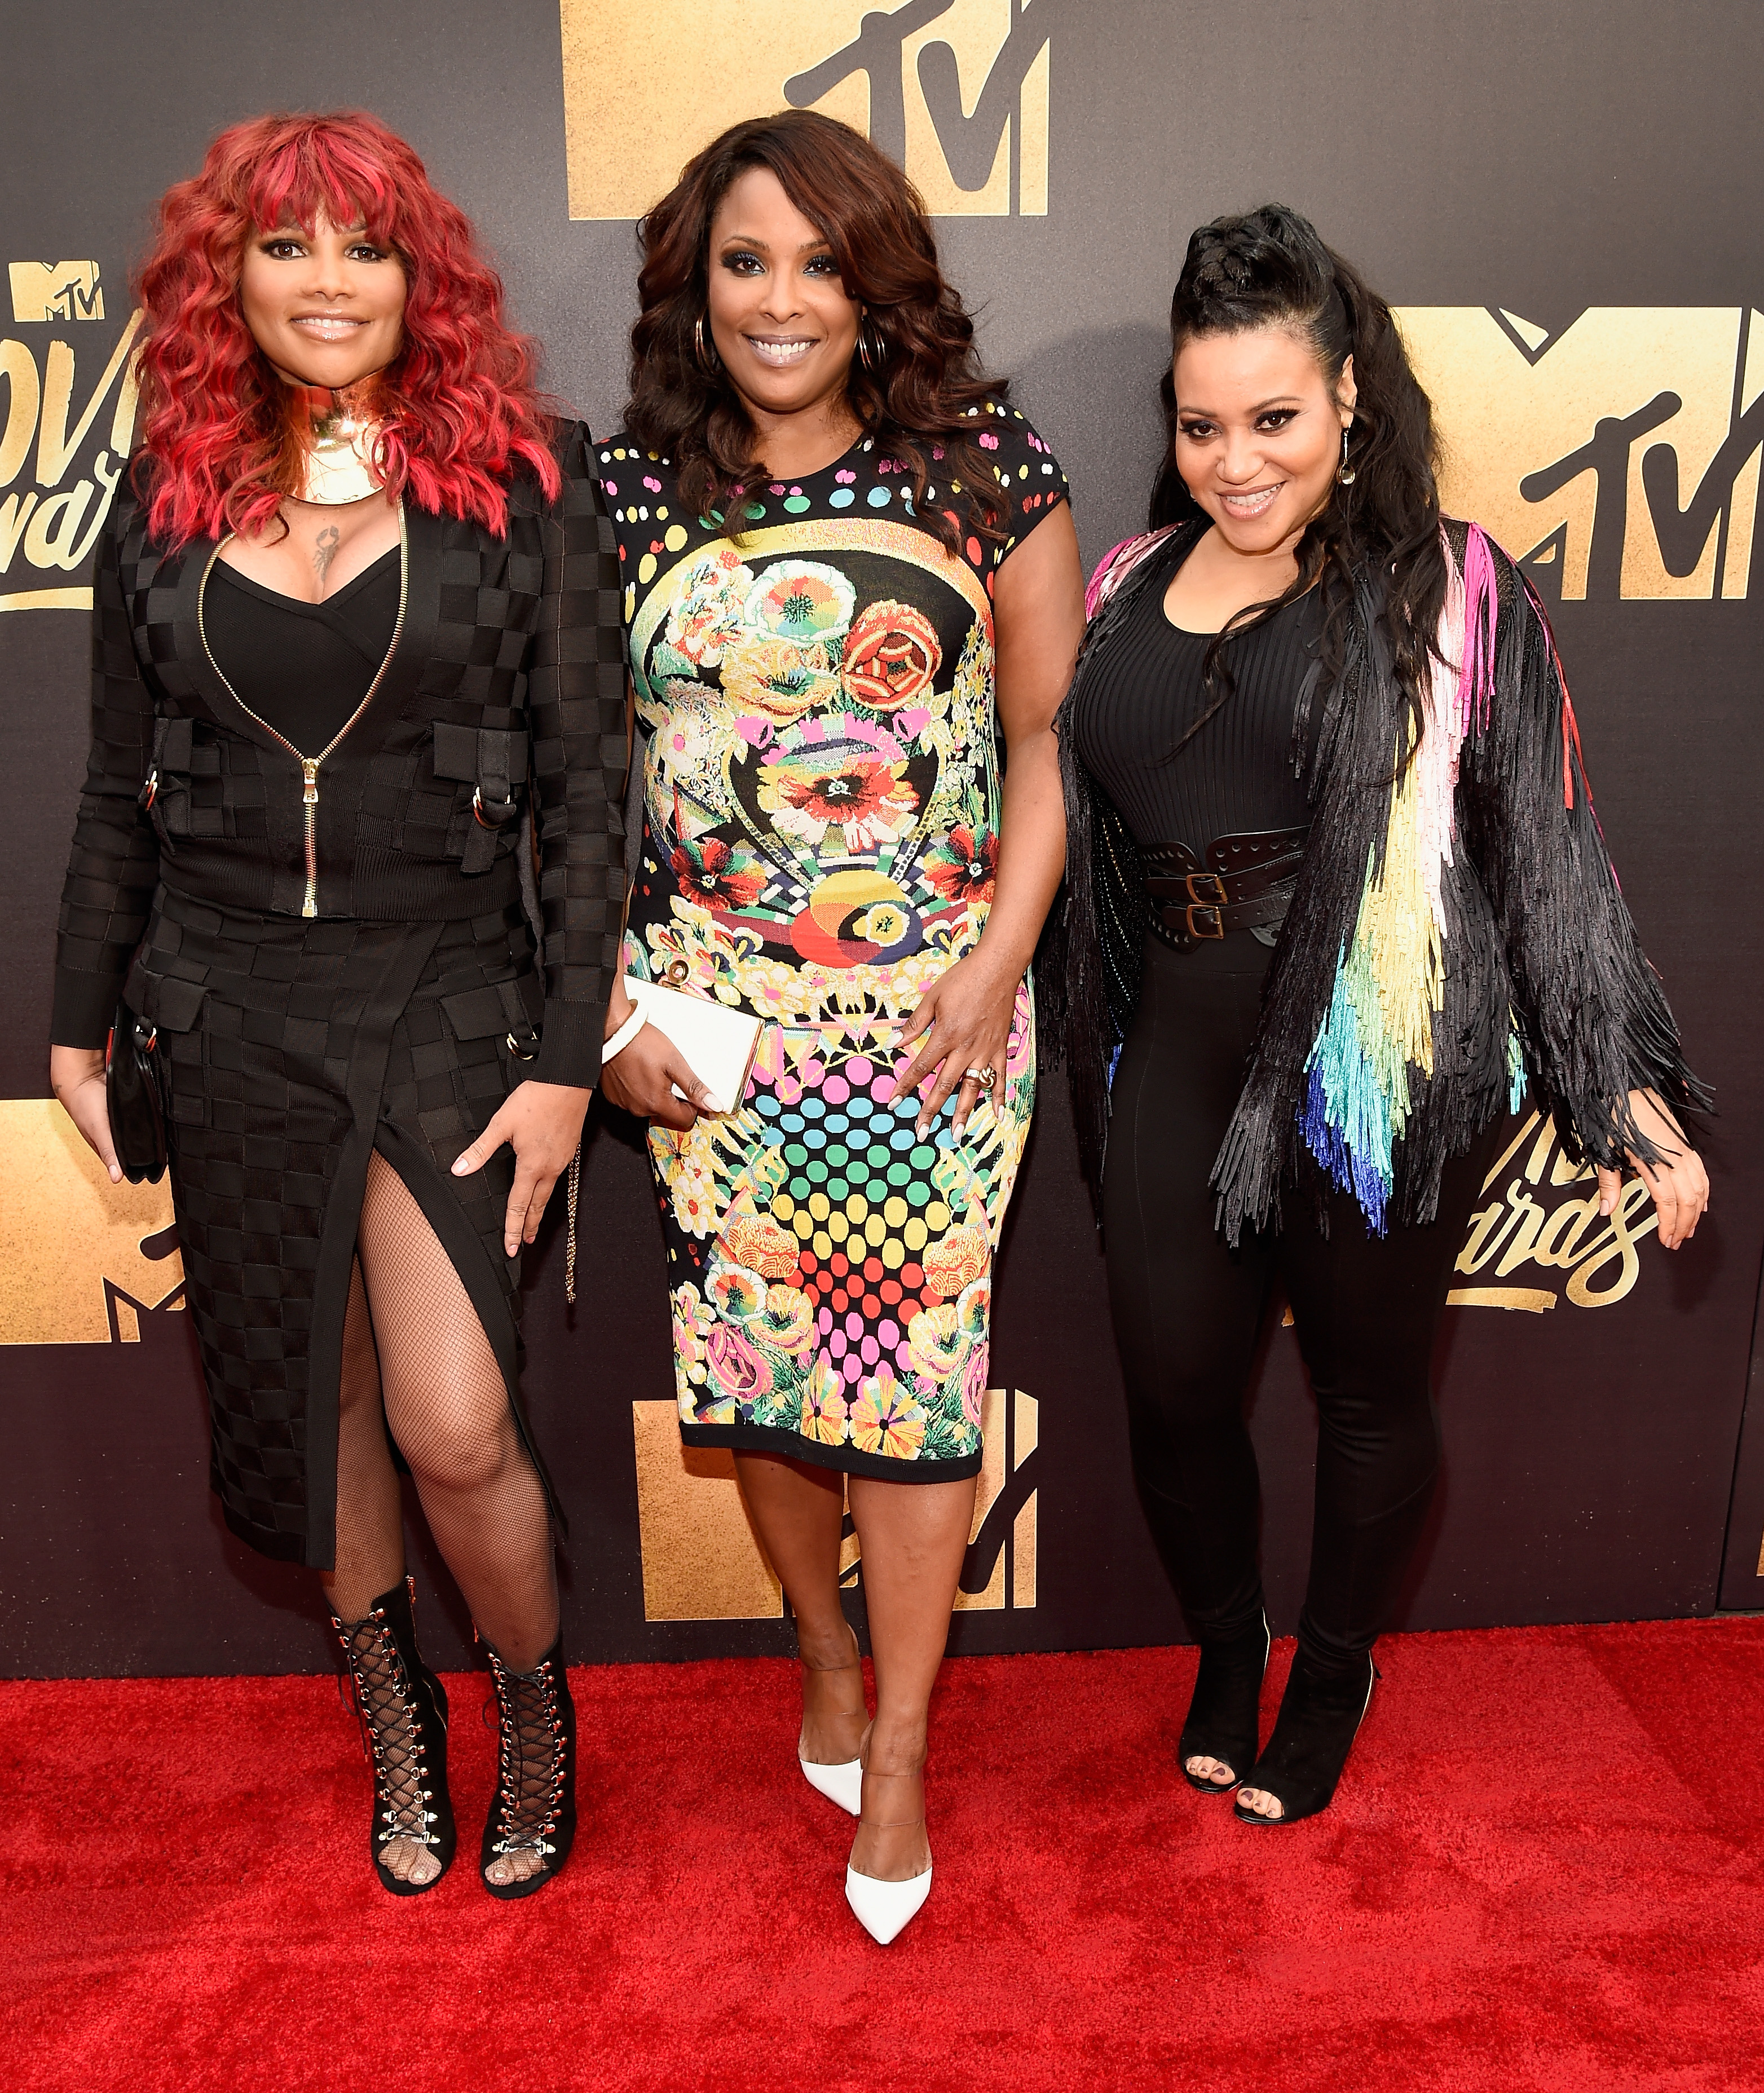 Sandra  Pepa  Denton, Deidra Muriel Roper, aka DJ Spinderella, and Cheryl  Salt  James of Salt-N-Pepa attend the 2016 MTV Movie Awards at Warner Bros. Studios on April 9, 2016 in Burbank, Calif.